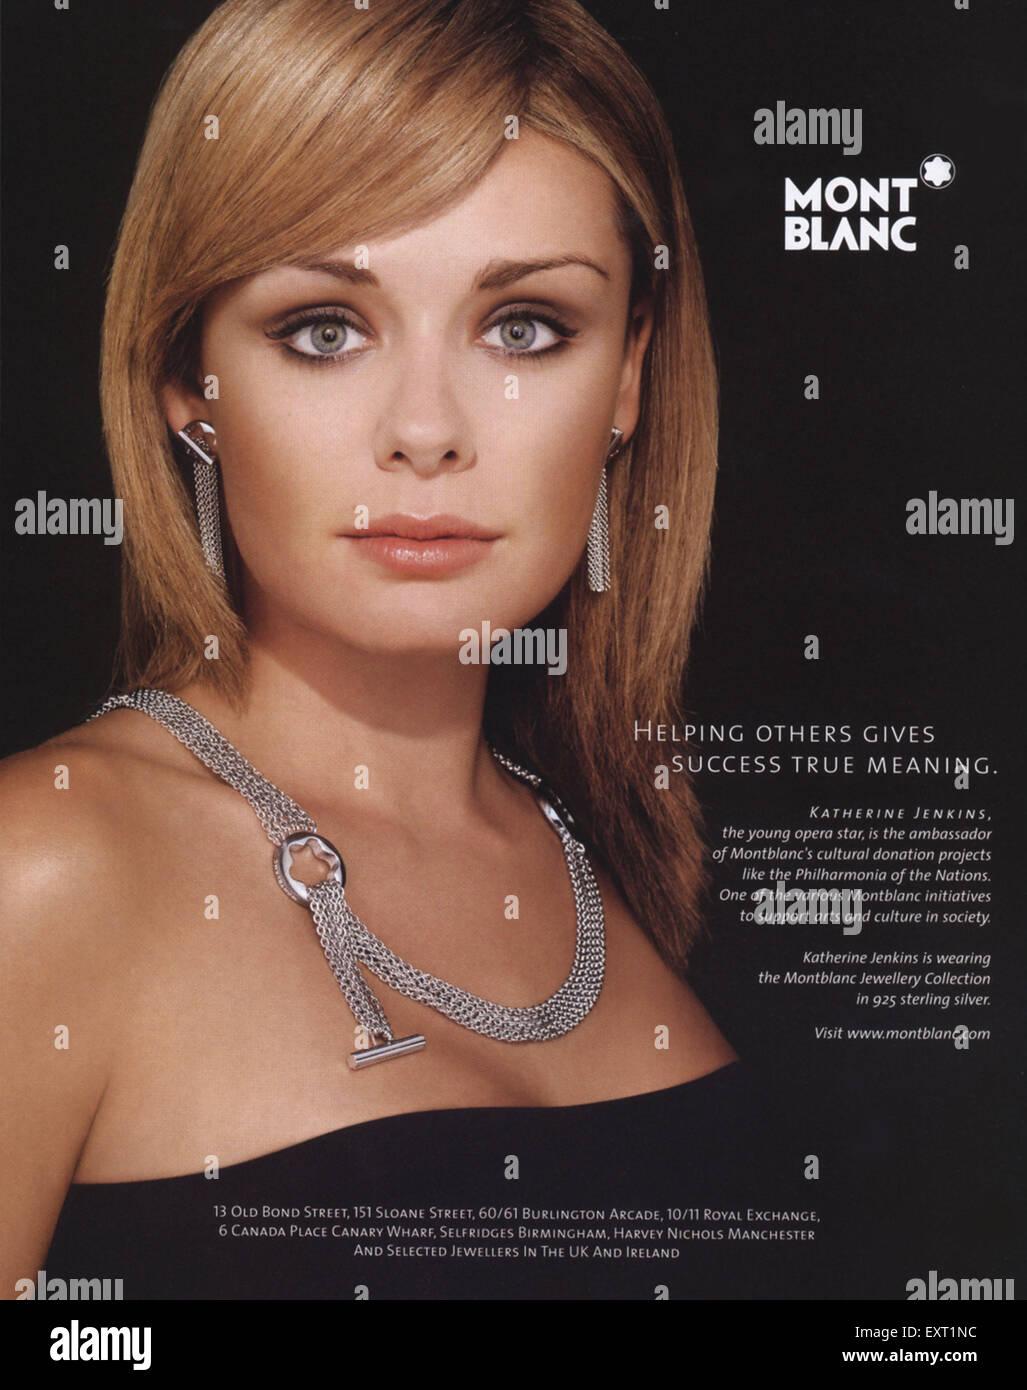 2000s UK Mont Blanc Magazine Advert - Stock Image